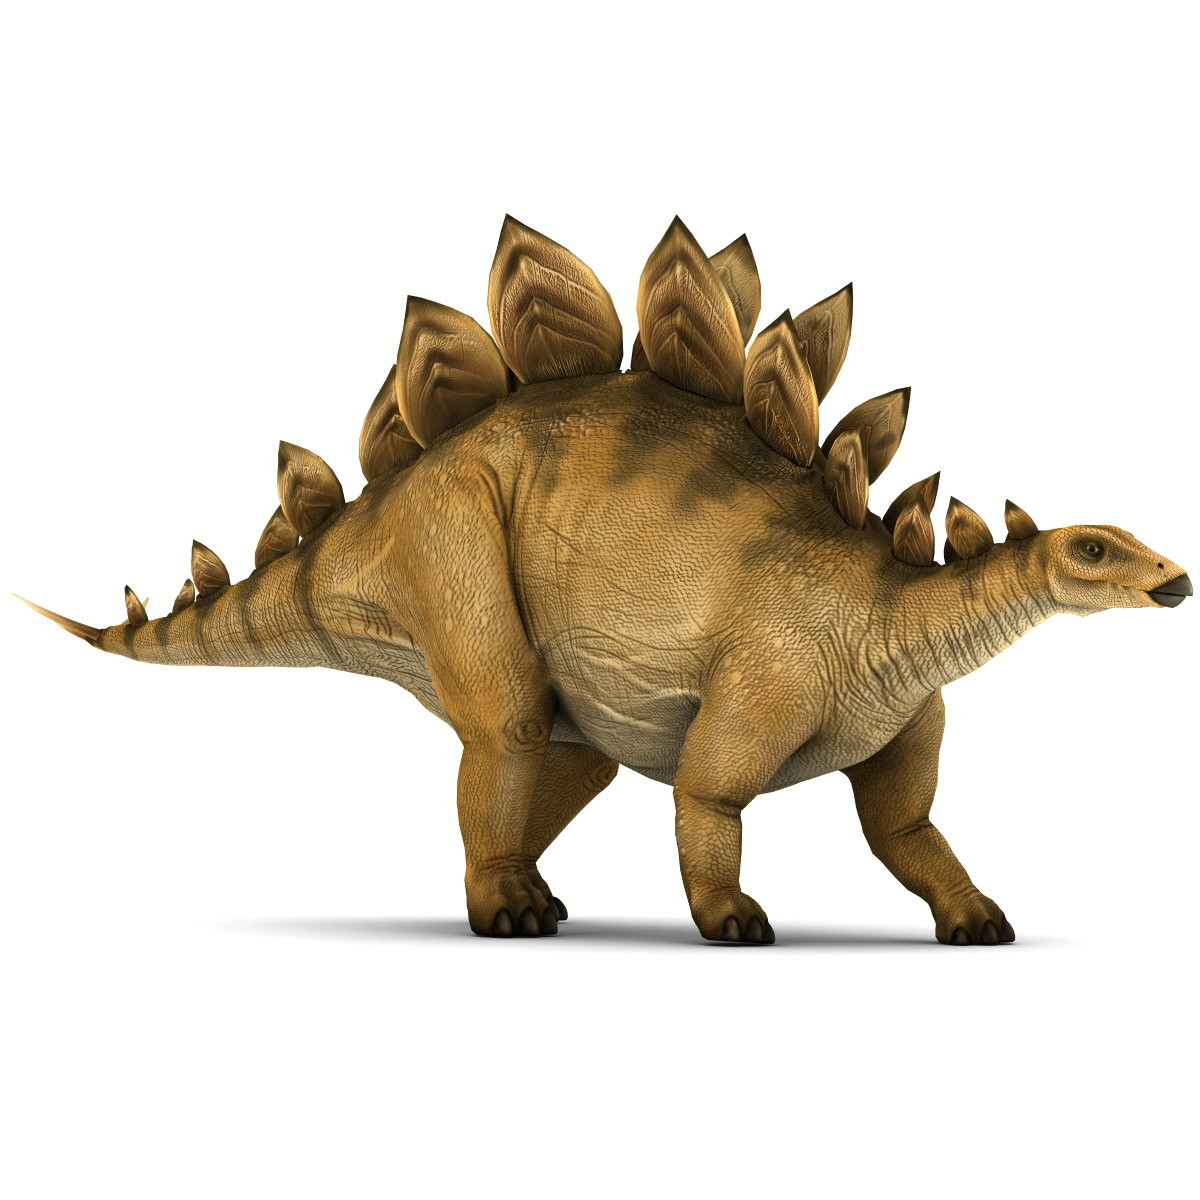 HQ Stegosaurus Wallpapers   File 189.92Kb